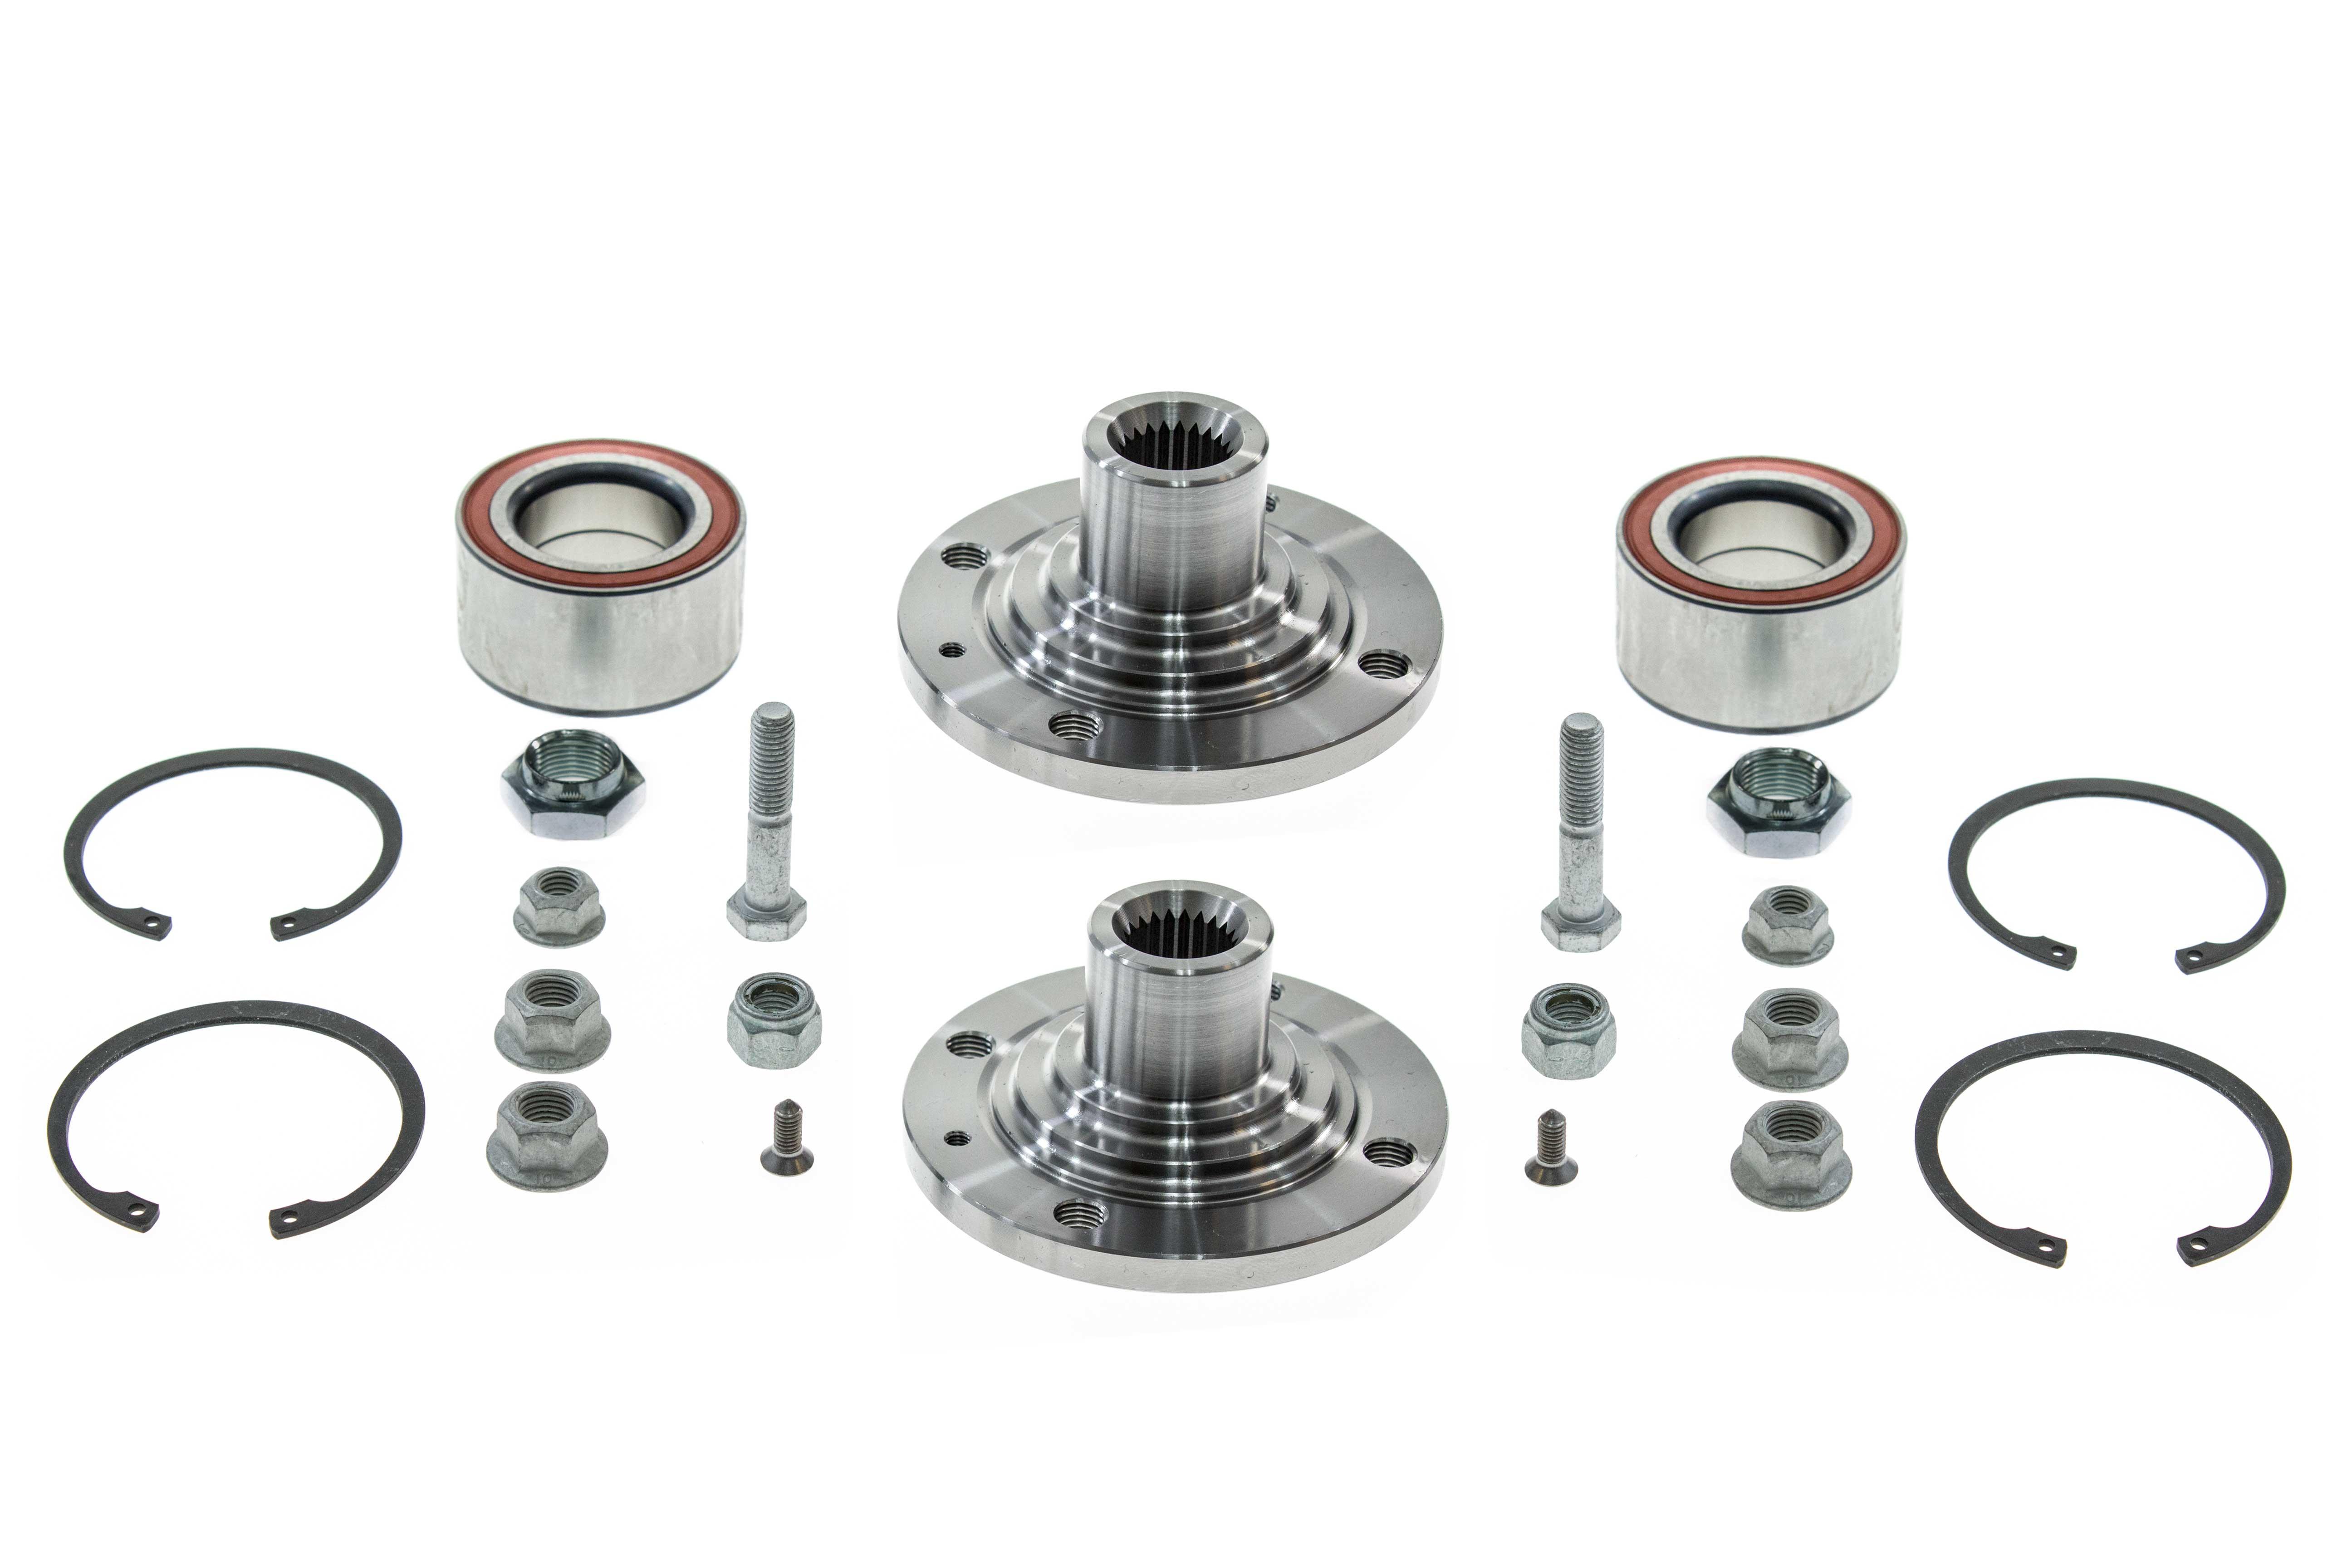 Aaz Preferred Vwfthub1kit Wheel Bearing Kit Front Hubs